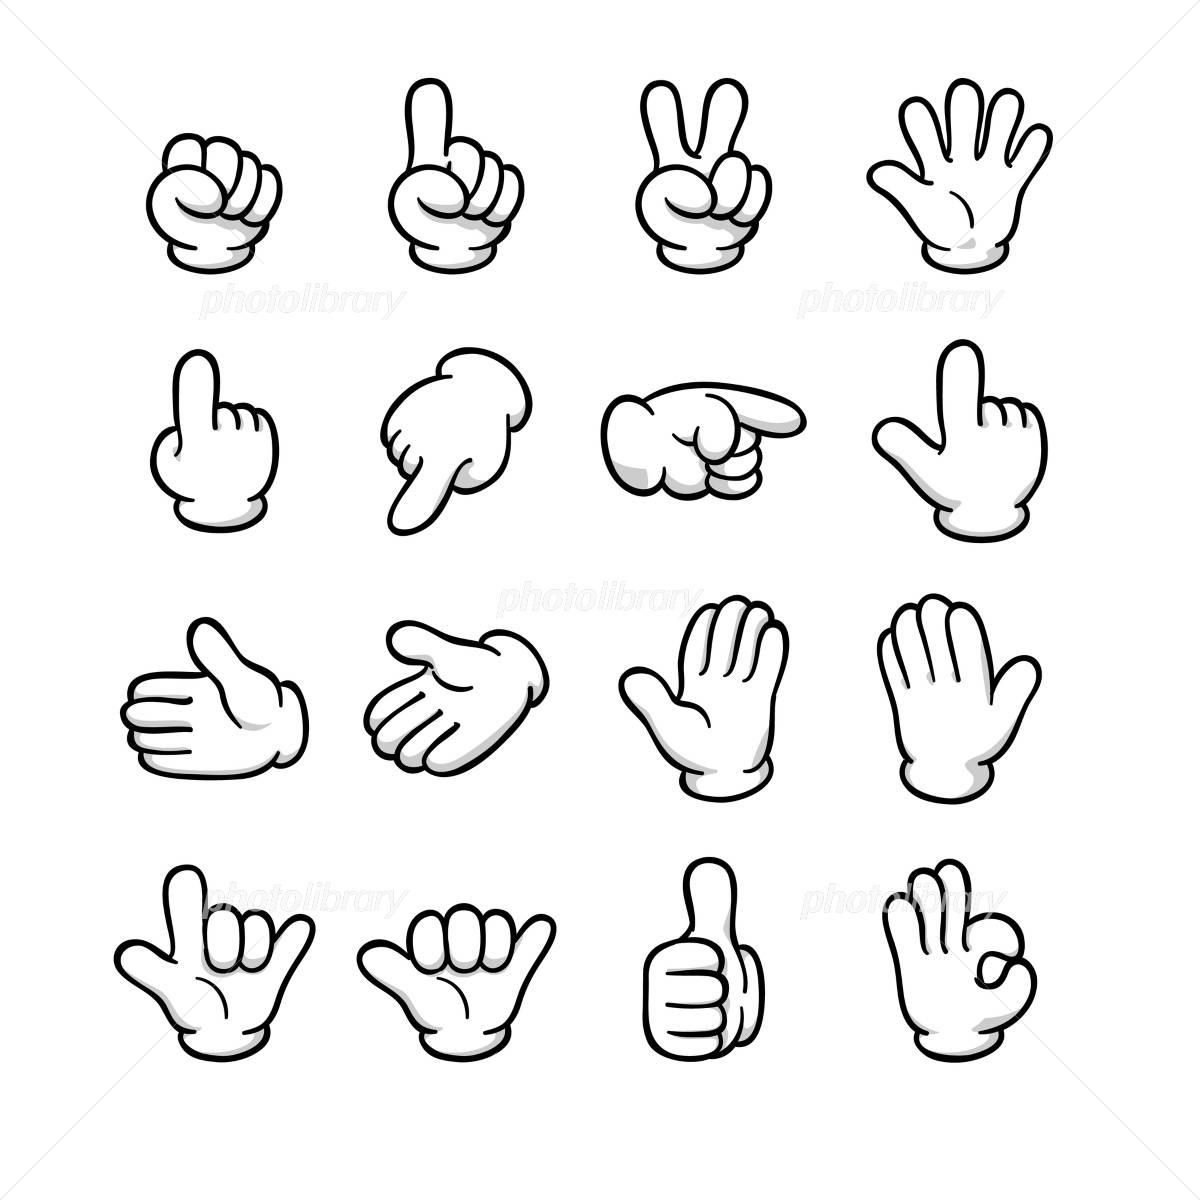 Hand signs イラスト素材